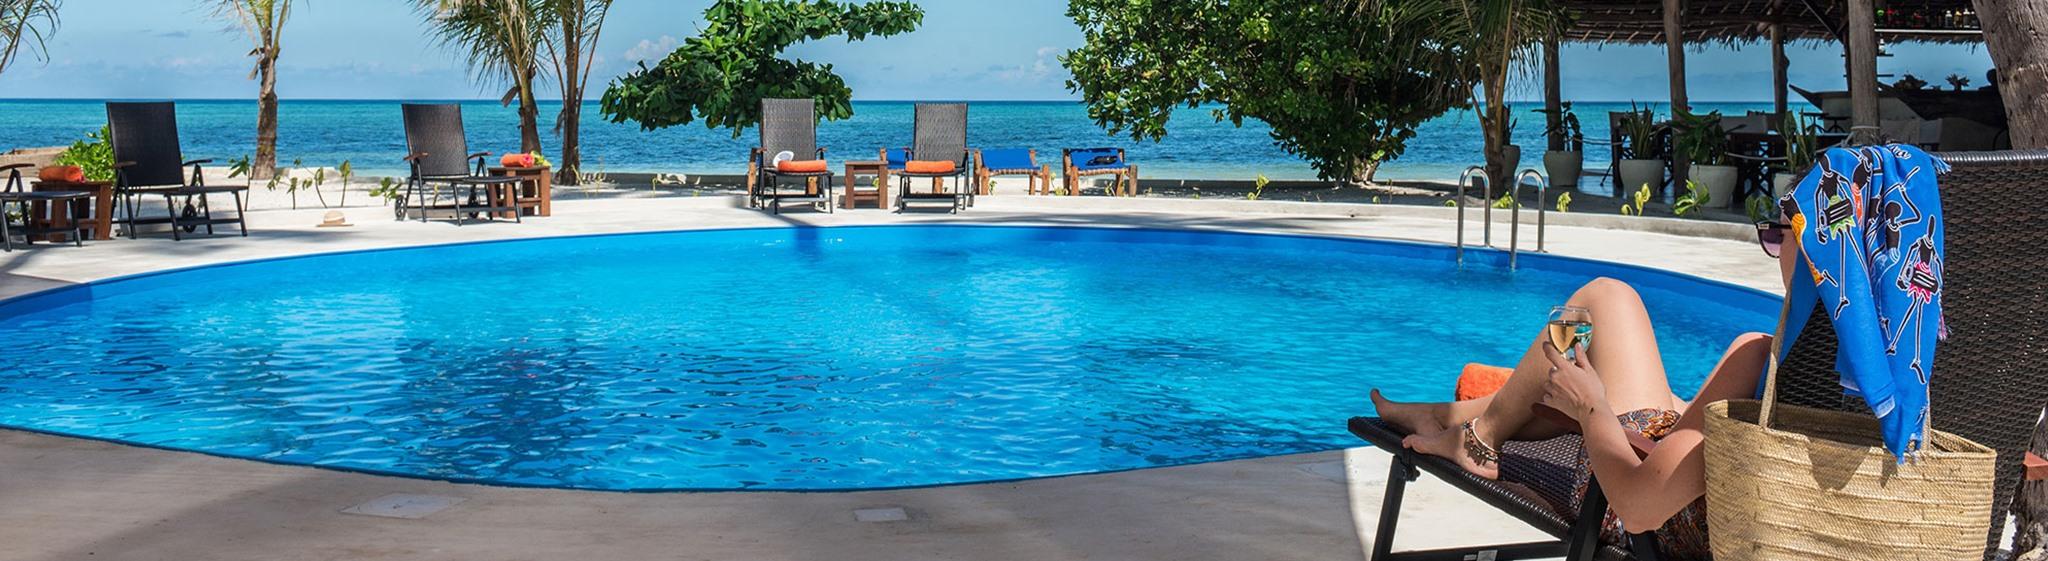 Zanzibar Magic Boutique Hotel - Safanta Tours & Travel Company Limited